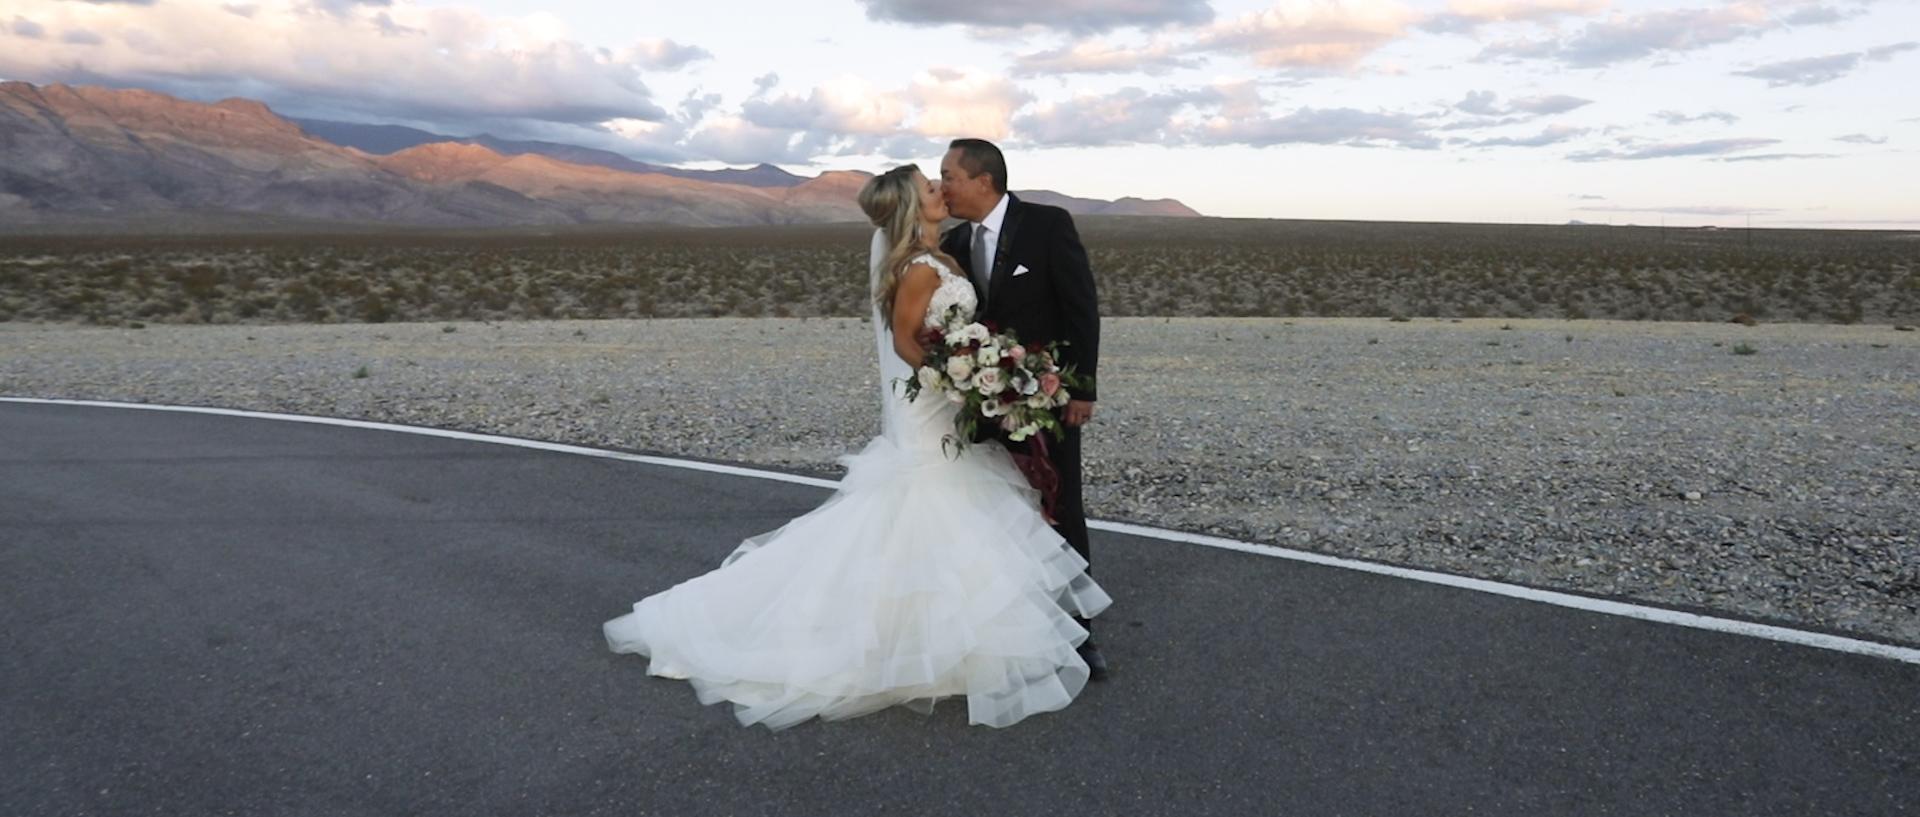 Jessica and Jeffrey Wedding Story.06_40_24_18.Still039.jpg